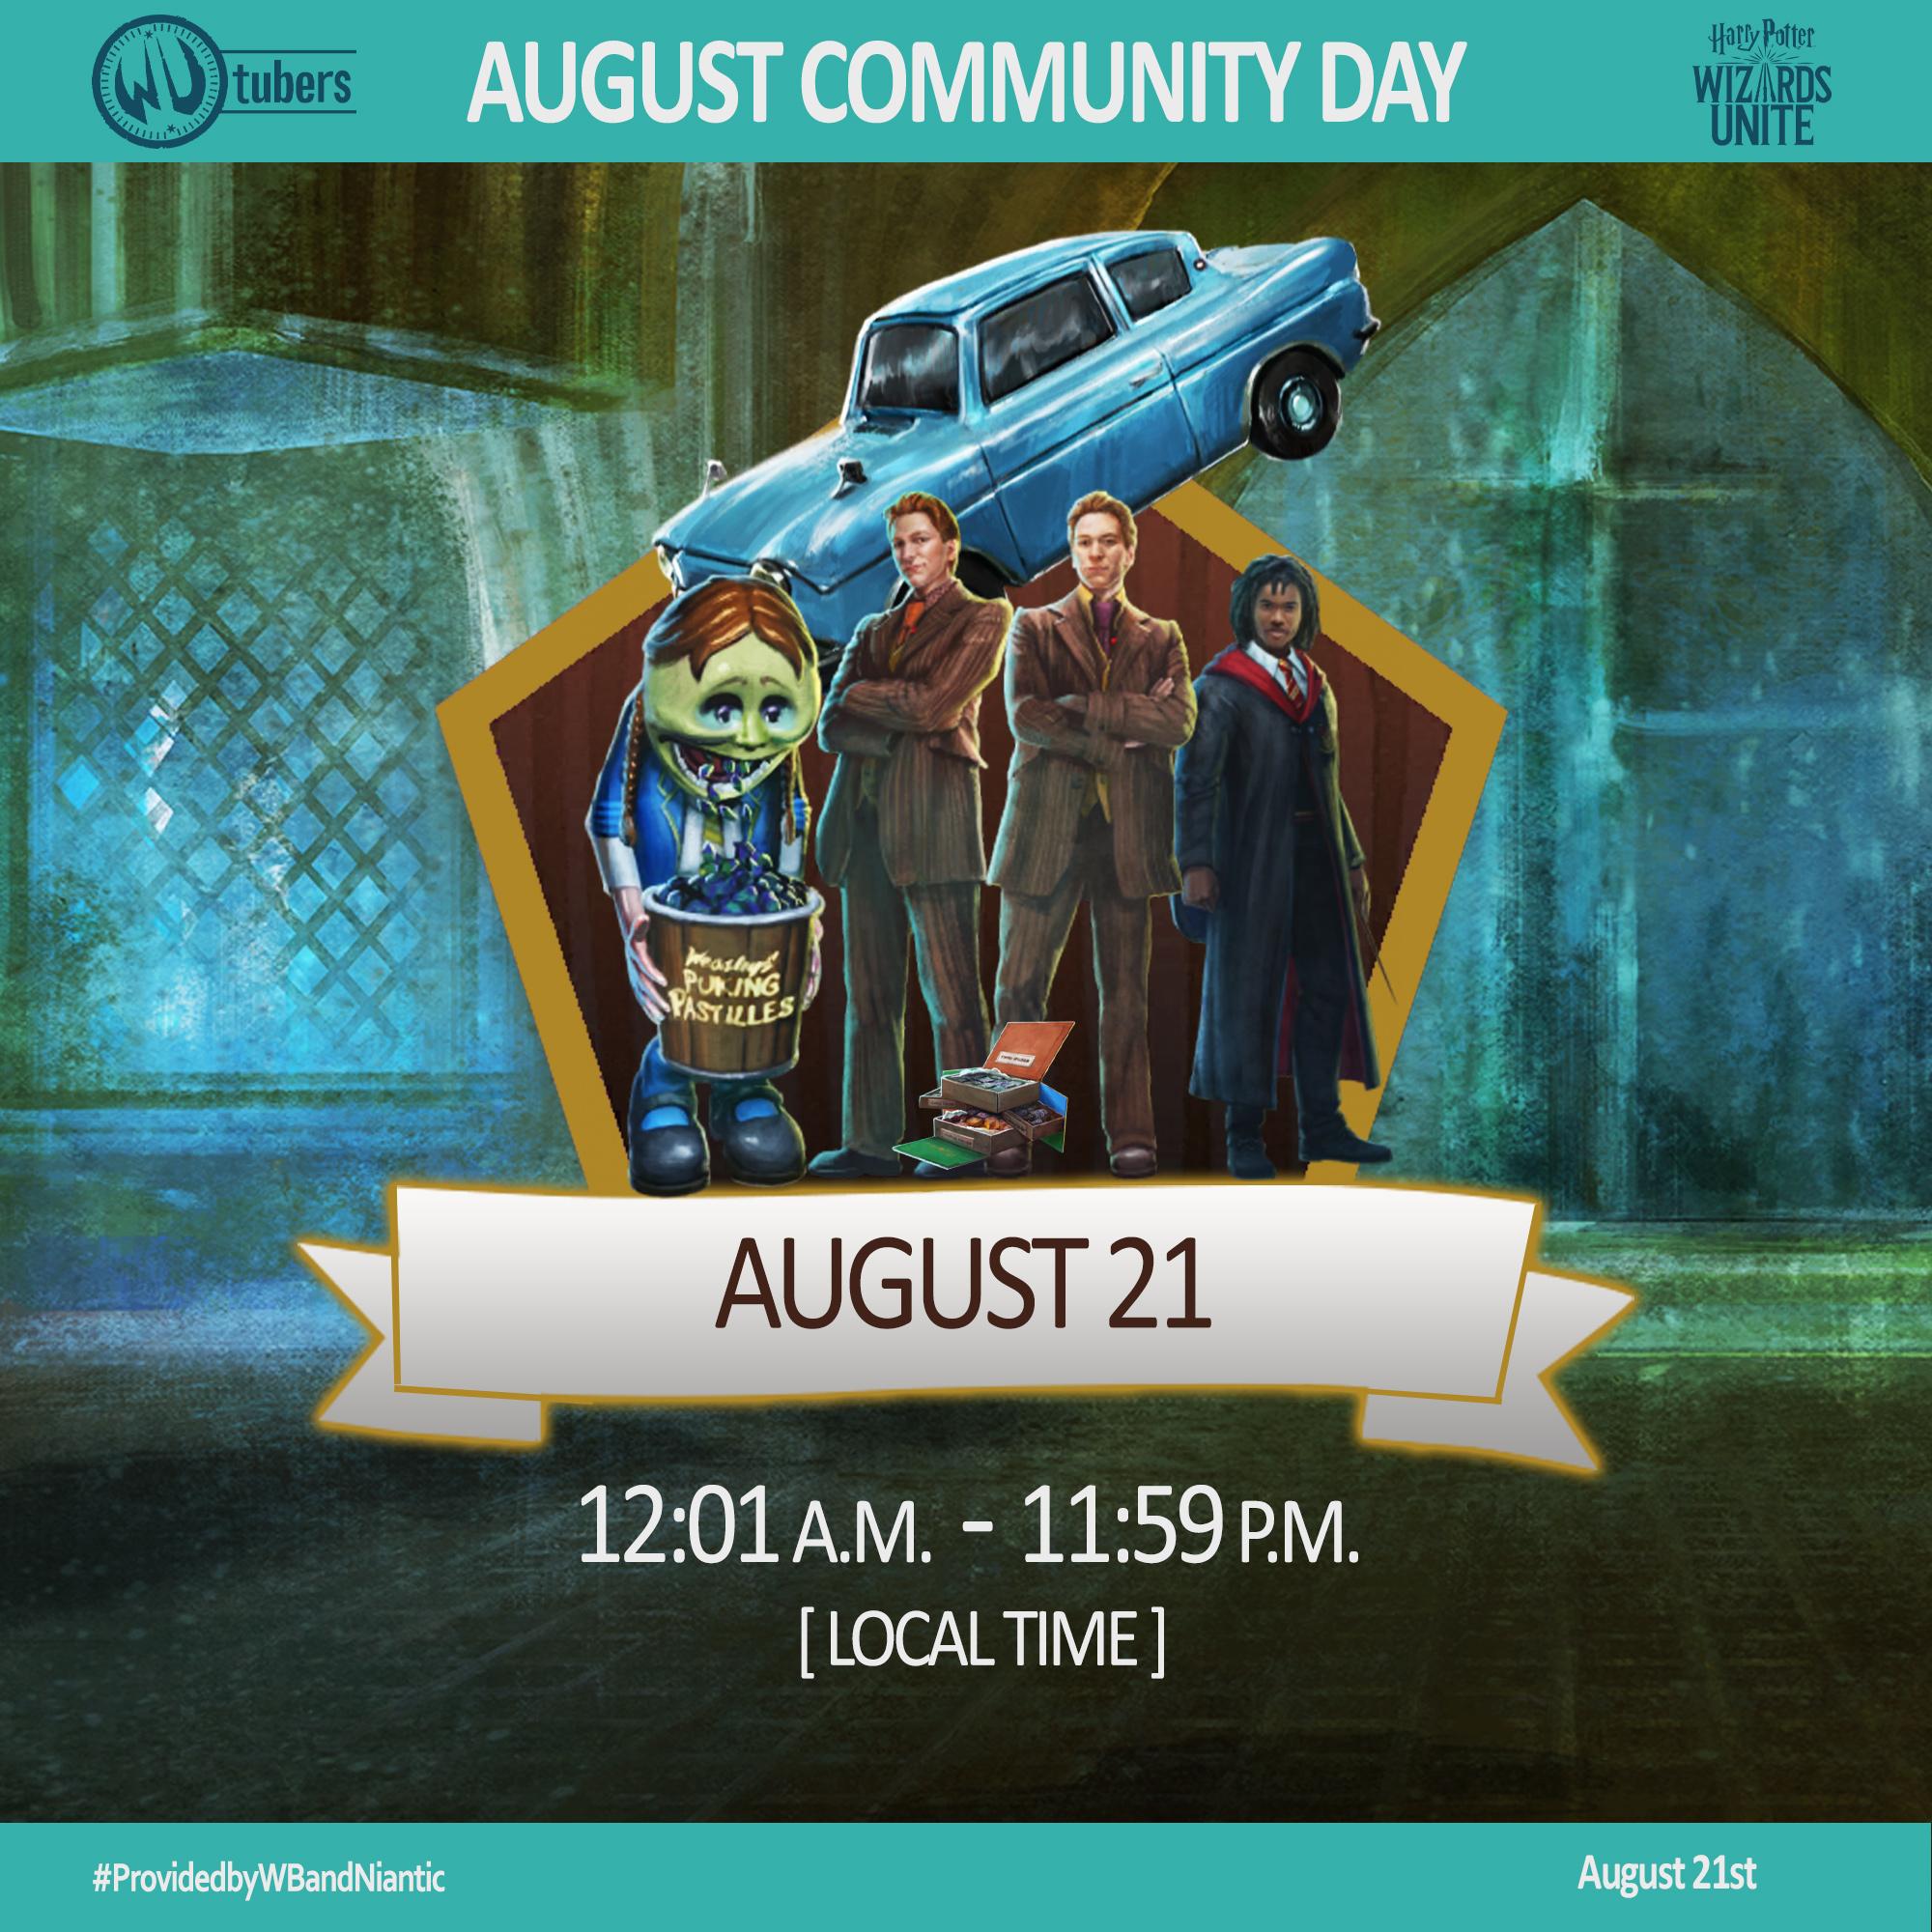 August_Community_Day_Date-1.jpg